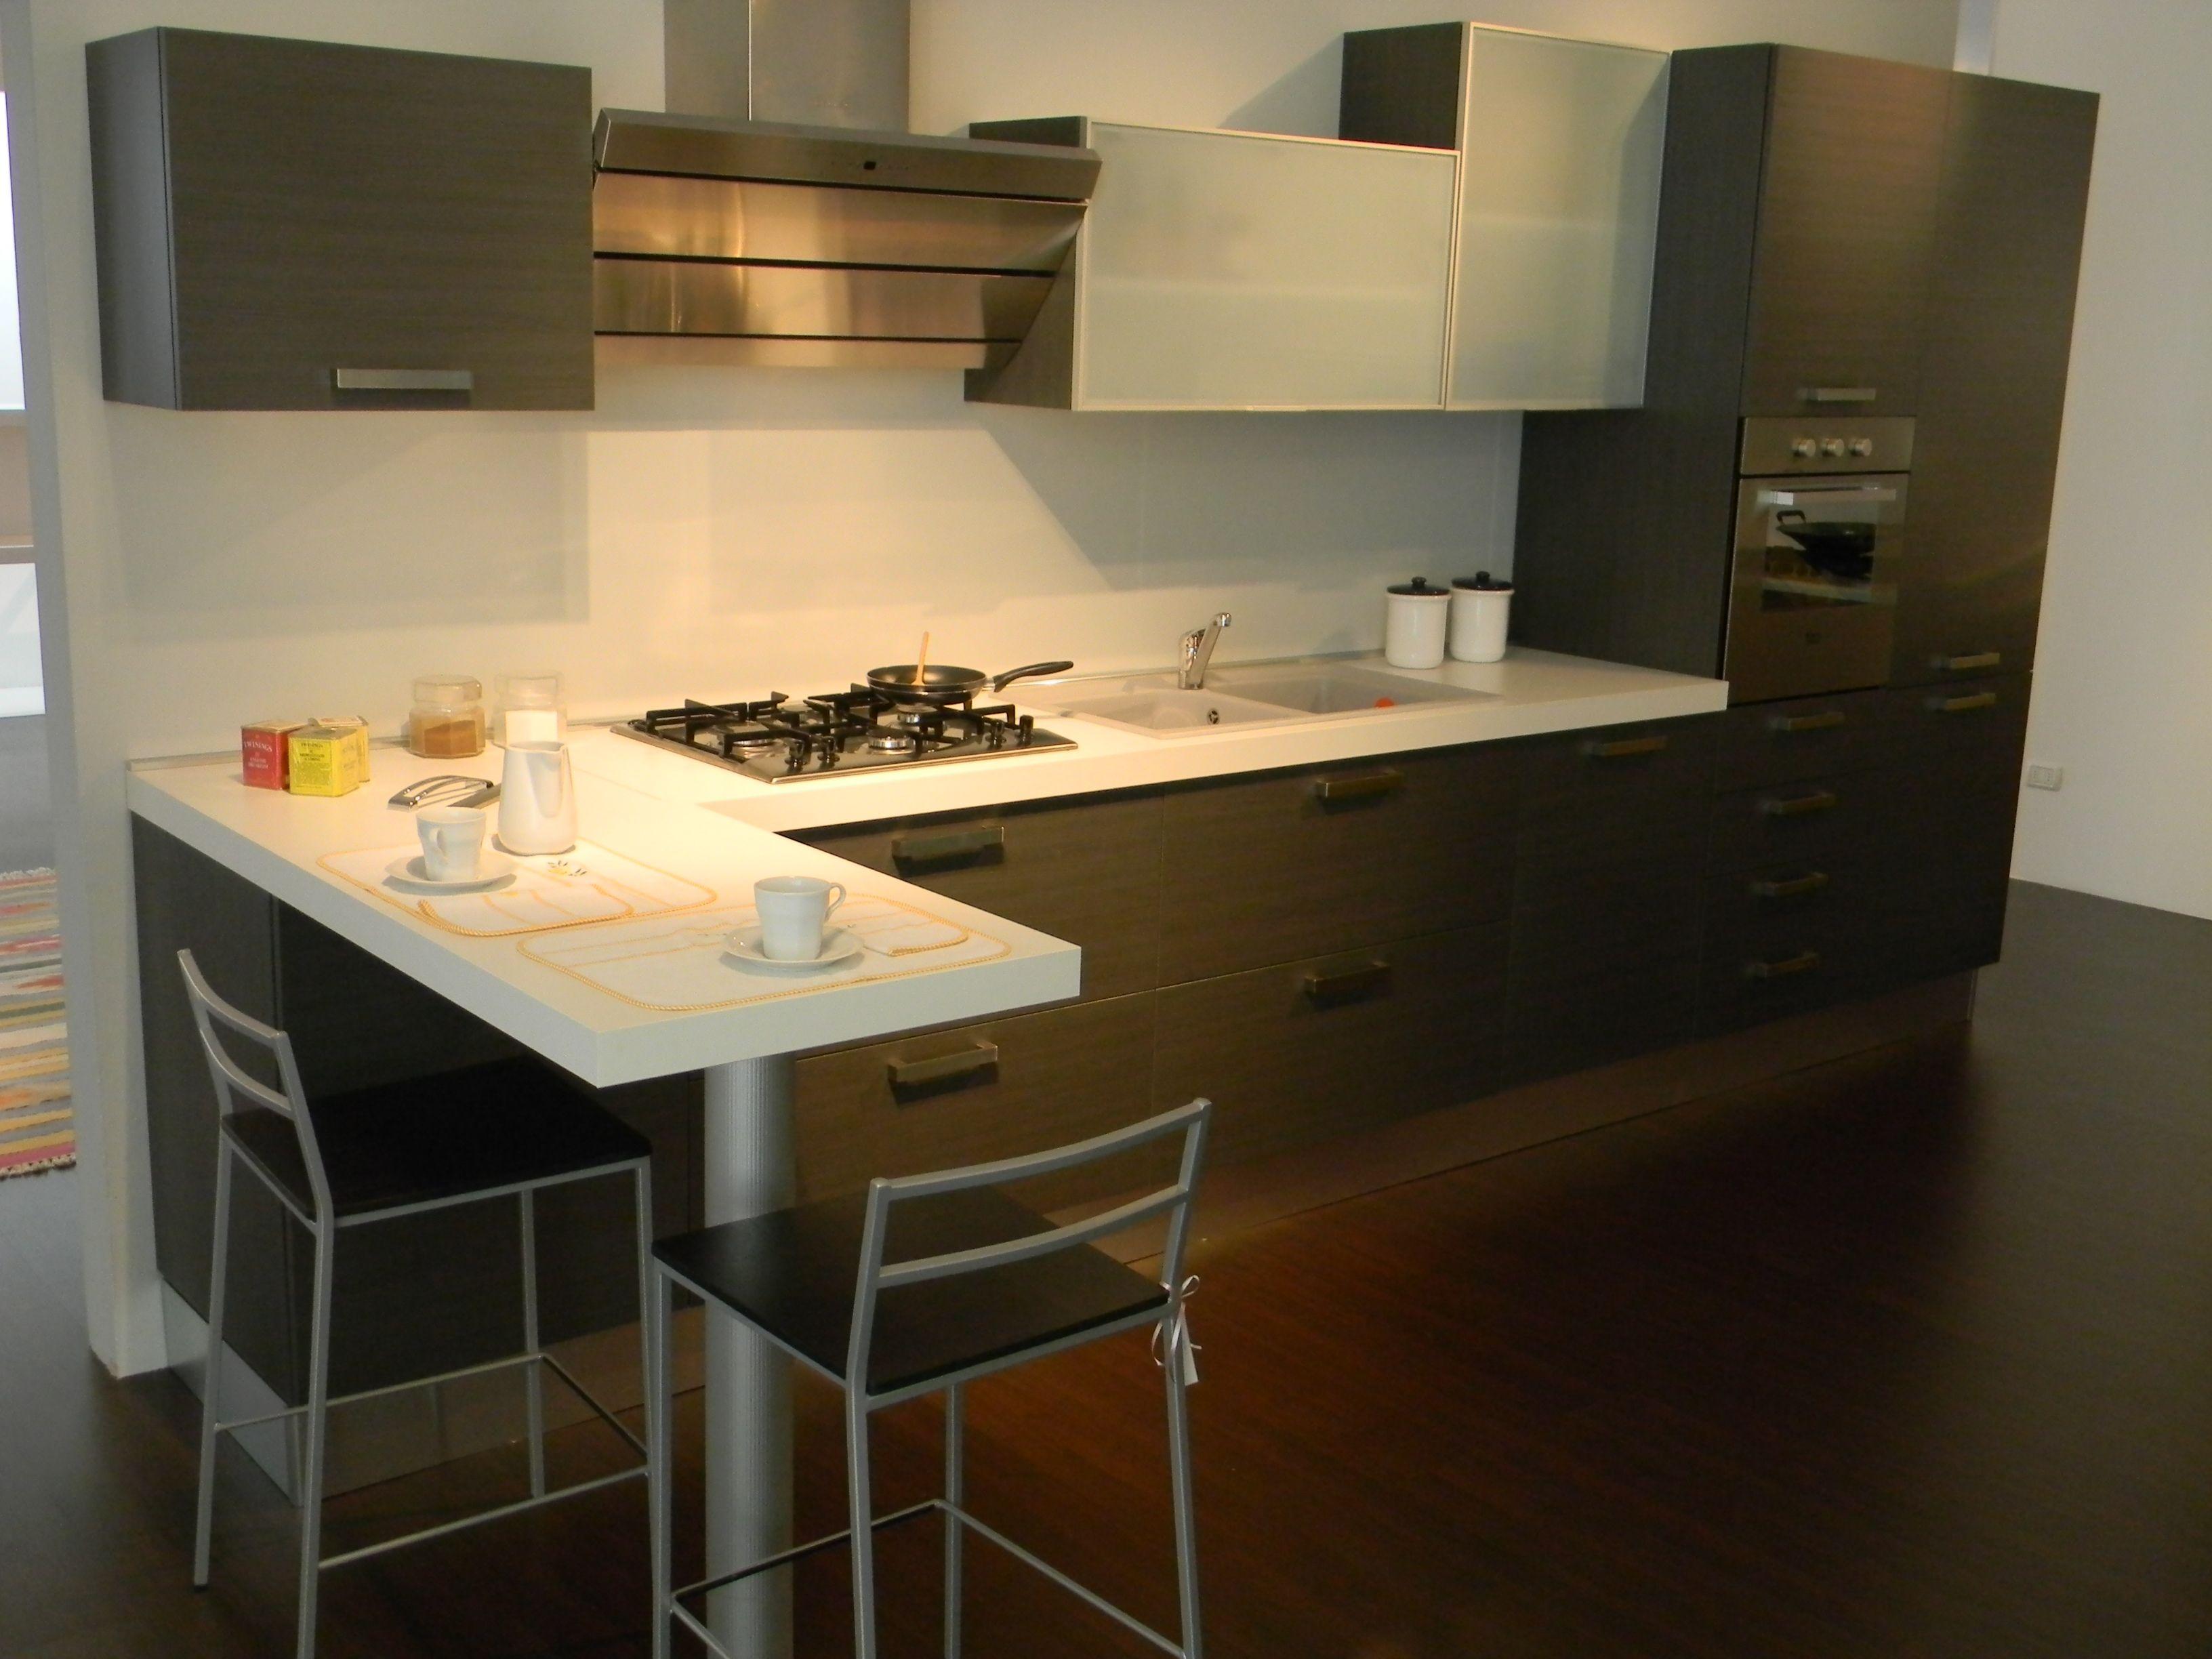 Cucina a penisola Cerca con Google kitchen Pinterest Searching